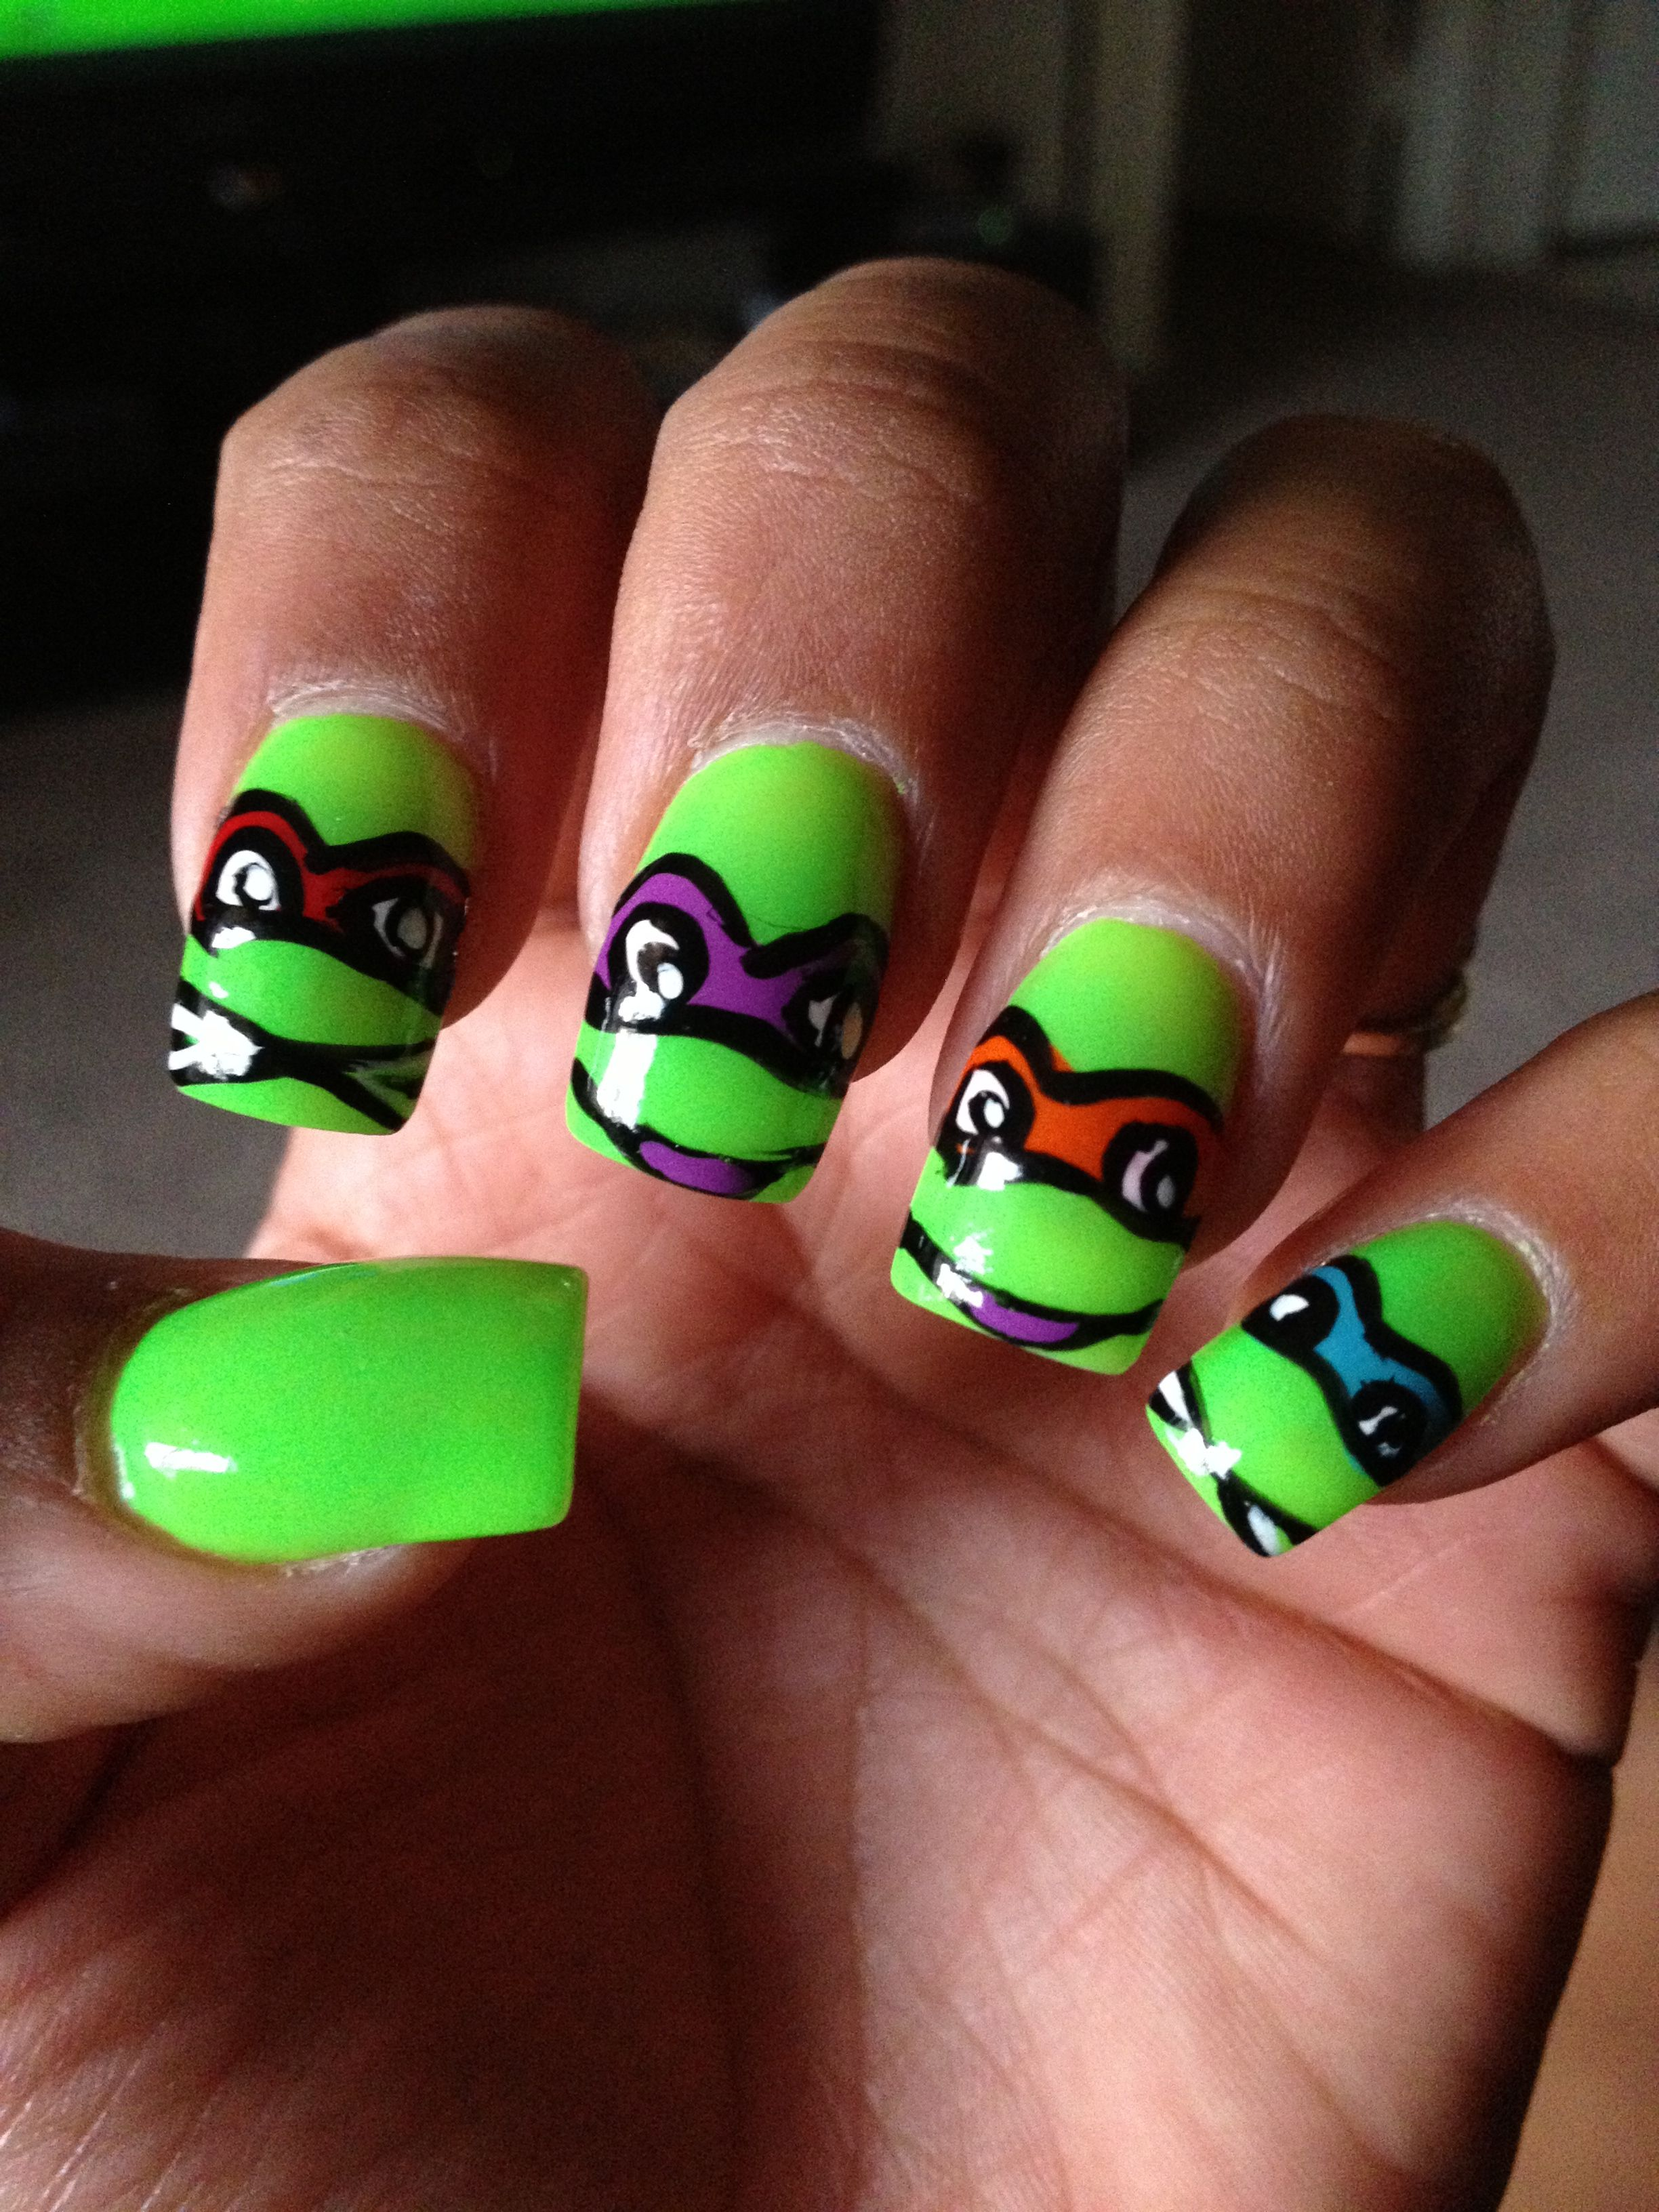 Ninja Turtle Nails   Nails <3   Pinterest   Ninja turtle nails ...